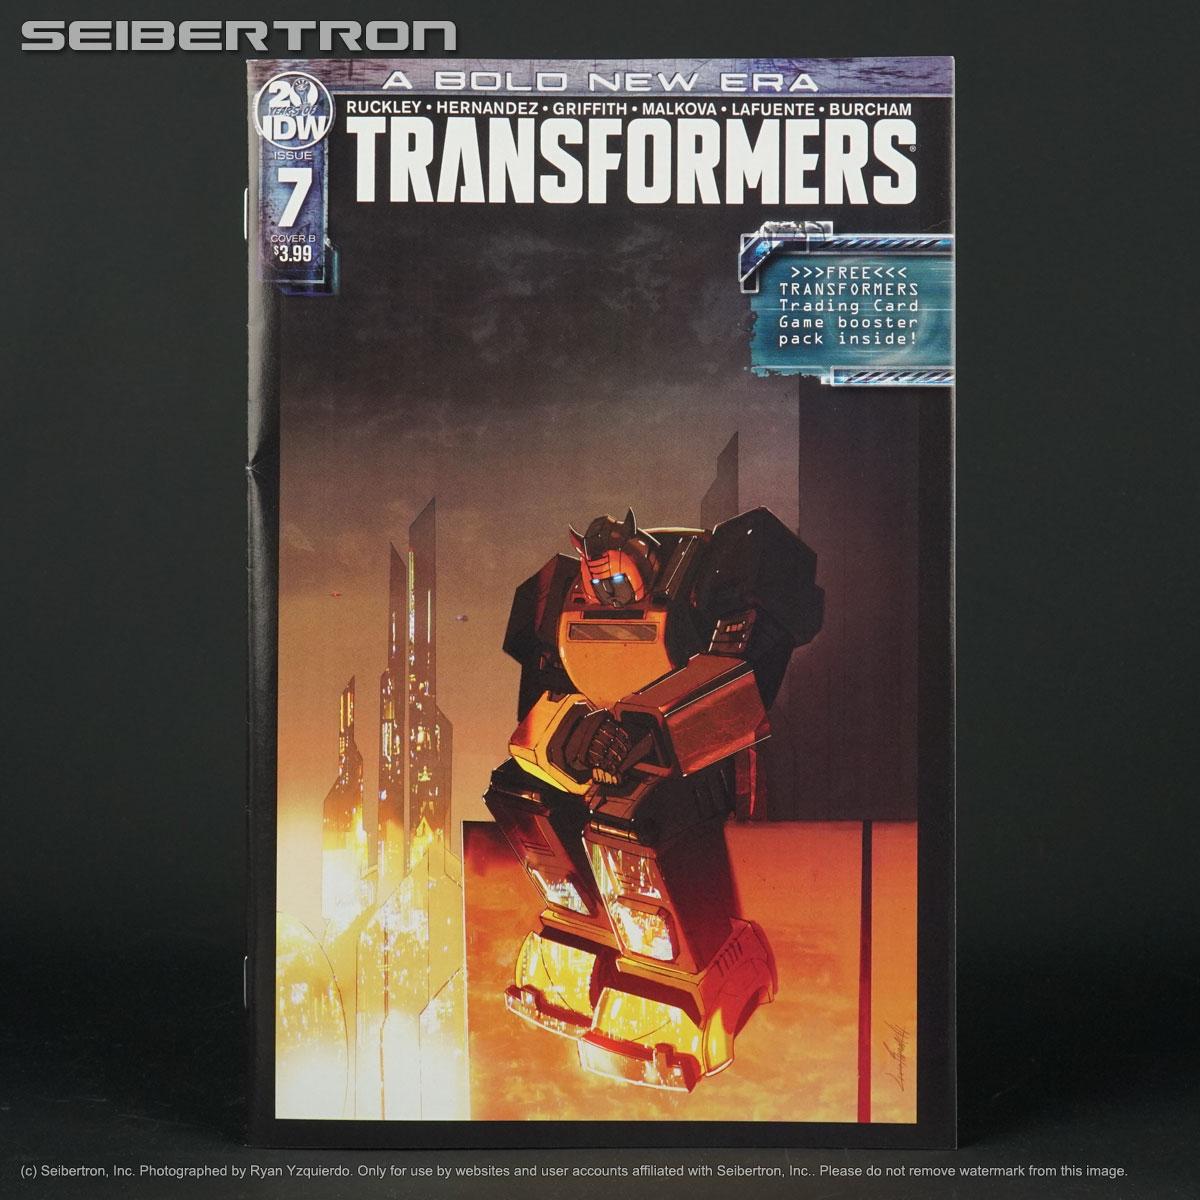 TRANSFORMERS #7 Cover B IDW Comic 2019 BOLD NEW ERA TCG Booster Pack 7B